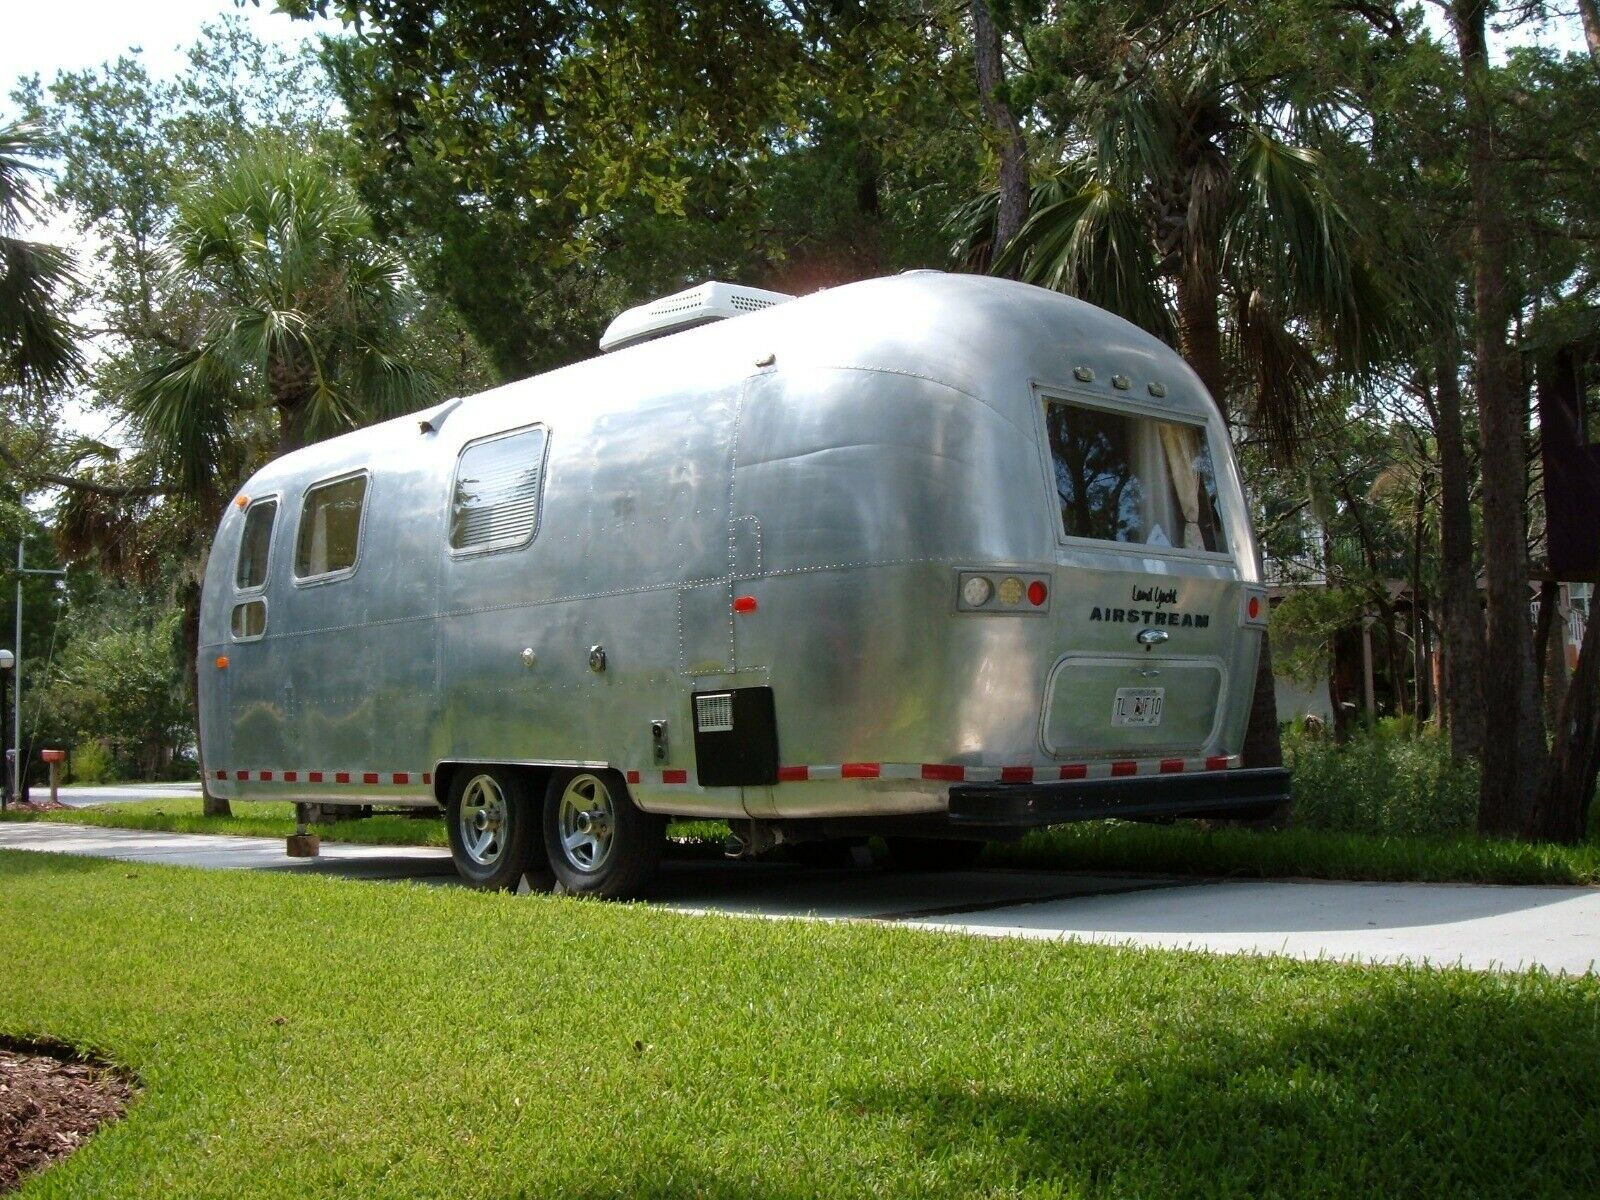 rebuilt 1969 Airstream Land Yacht camper